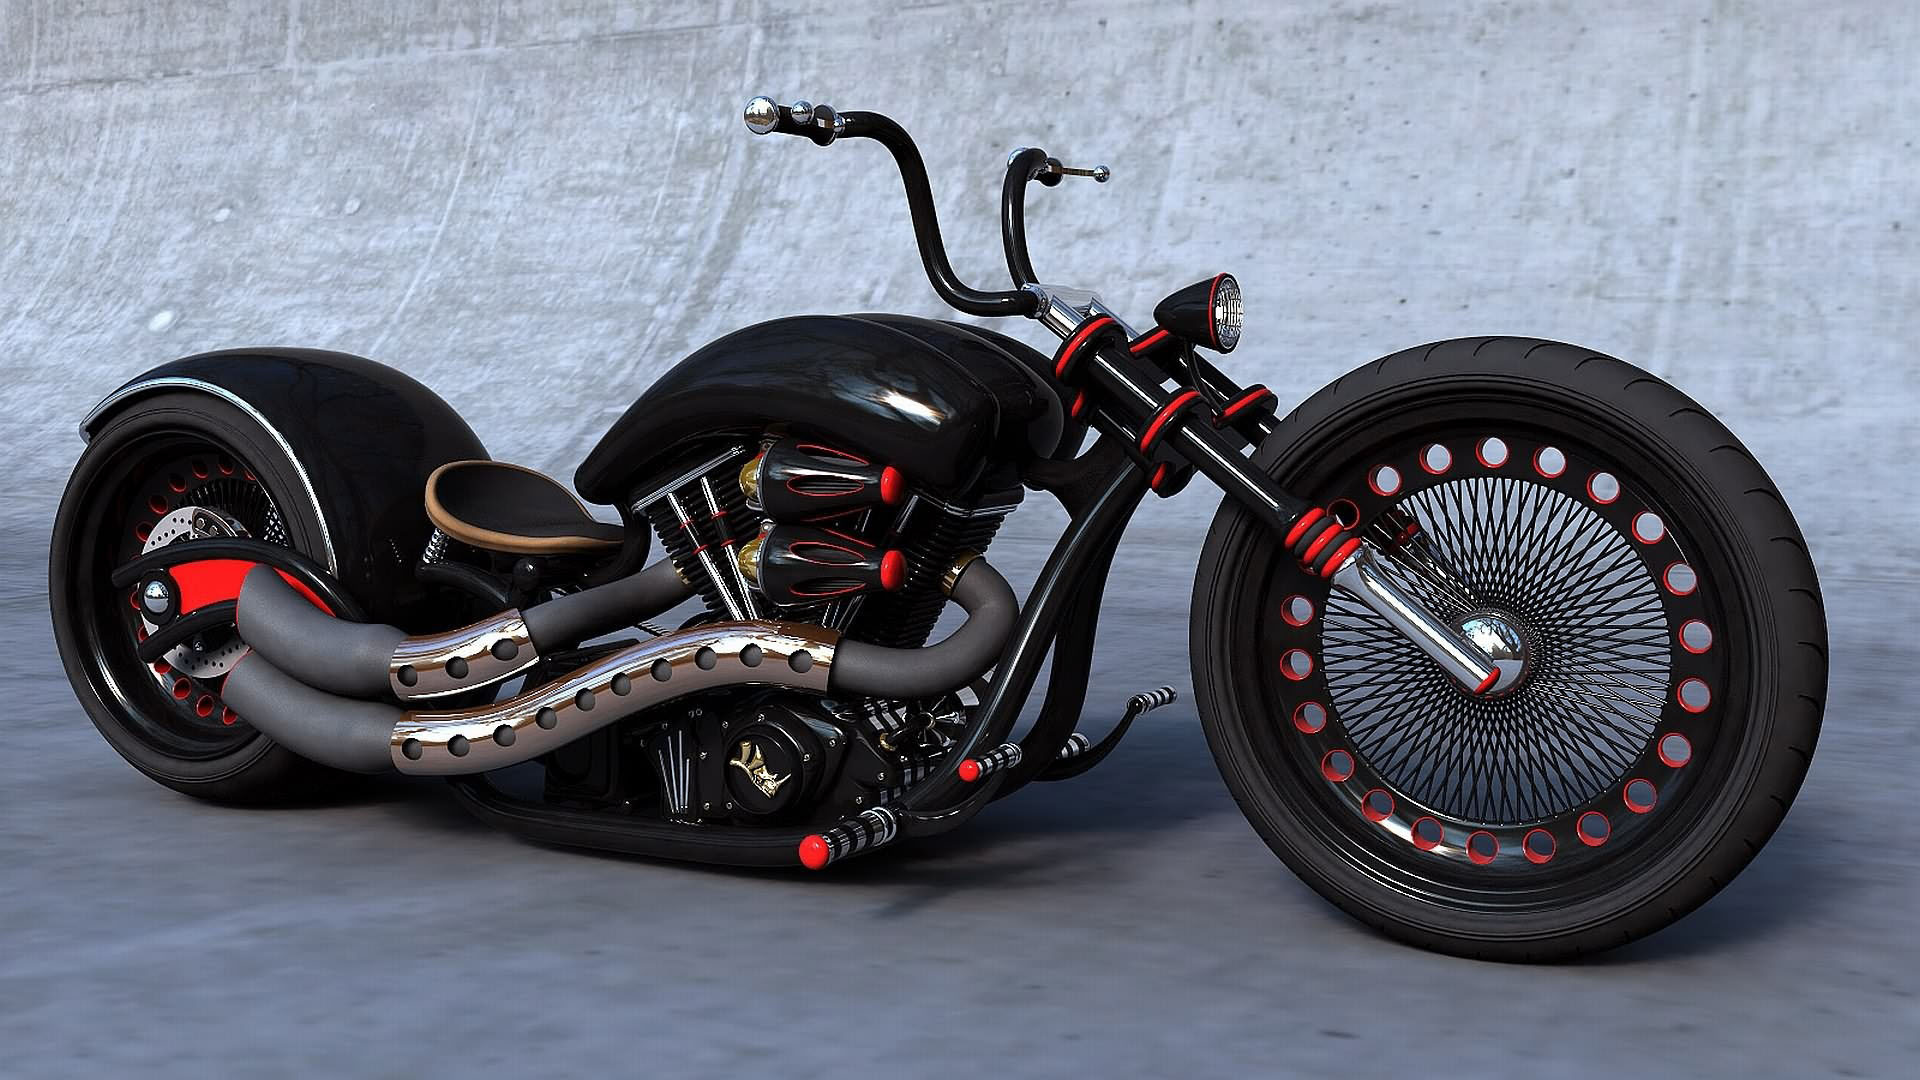 Najlepsi Motorcikli Goodwp.com_24543